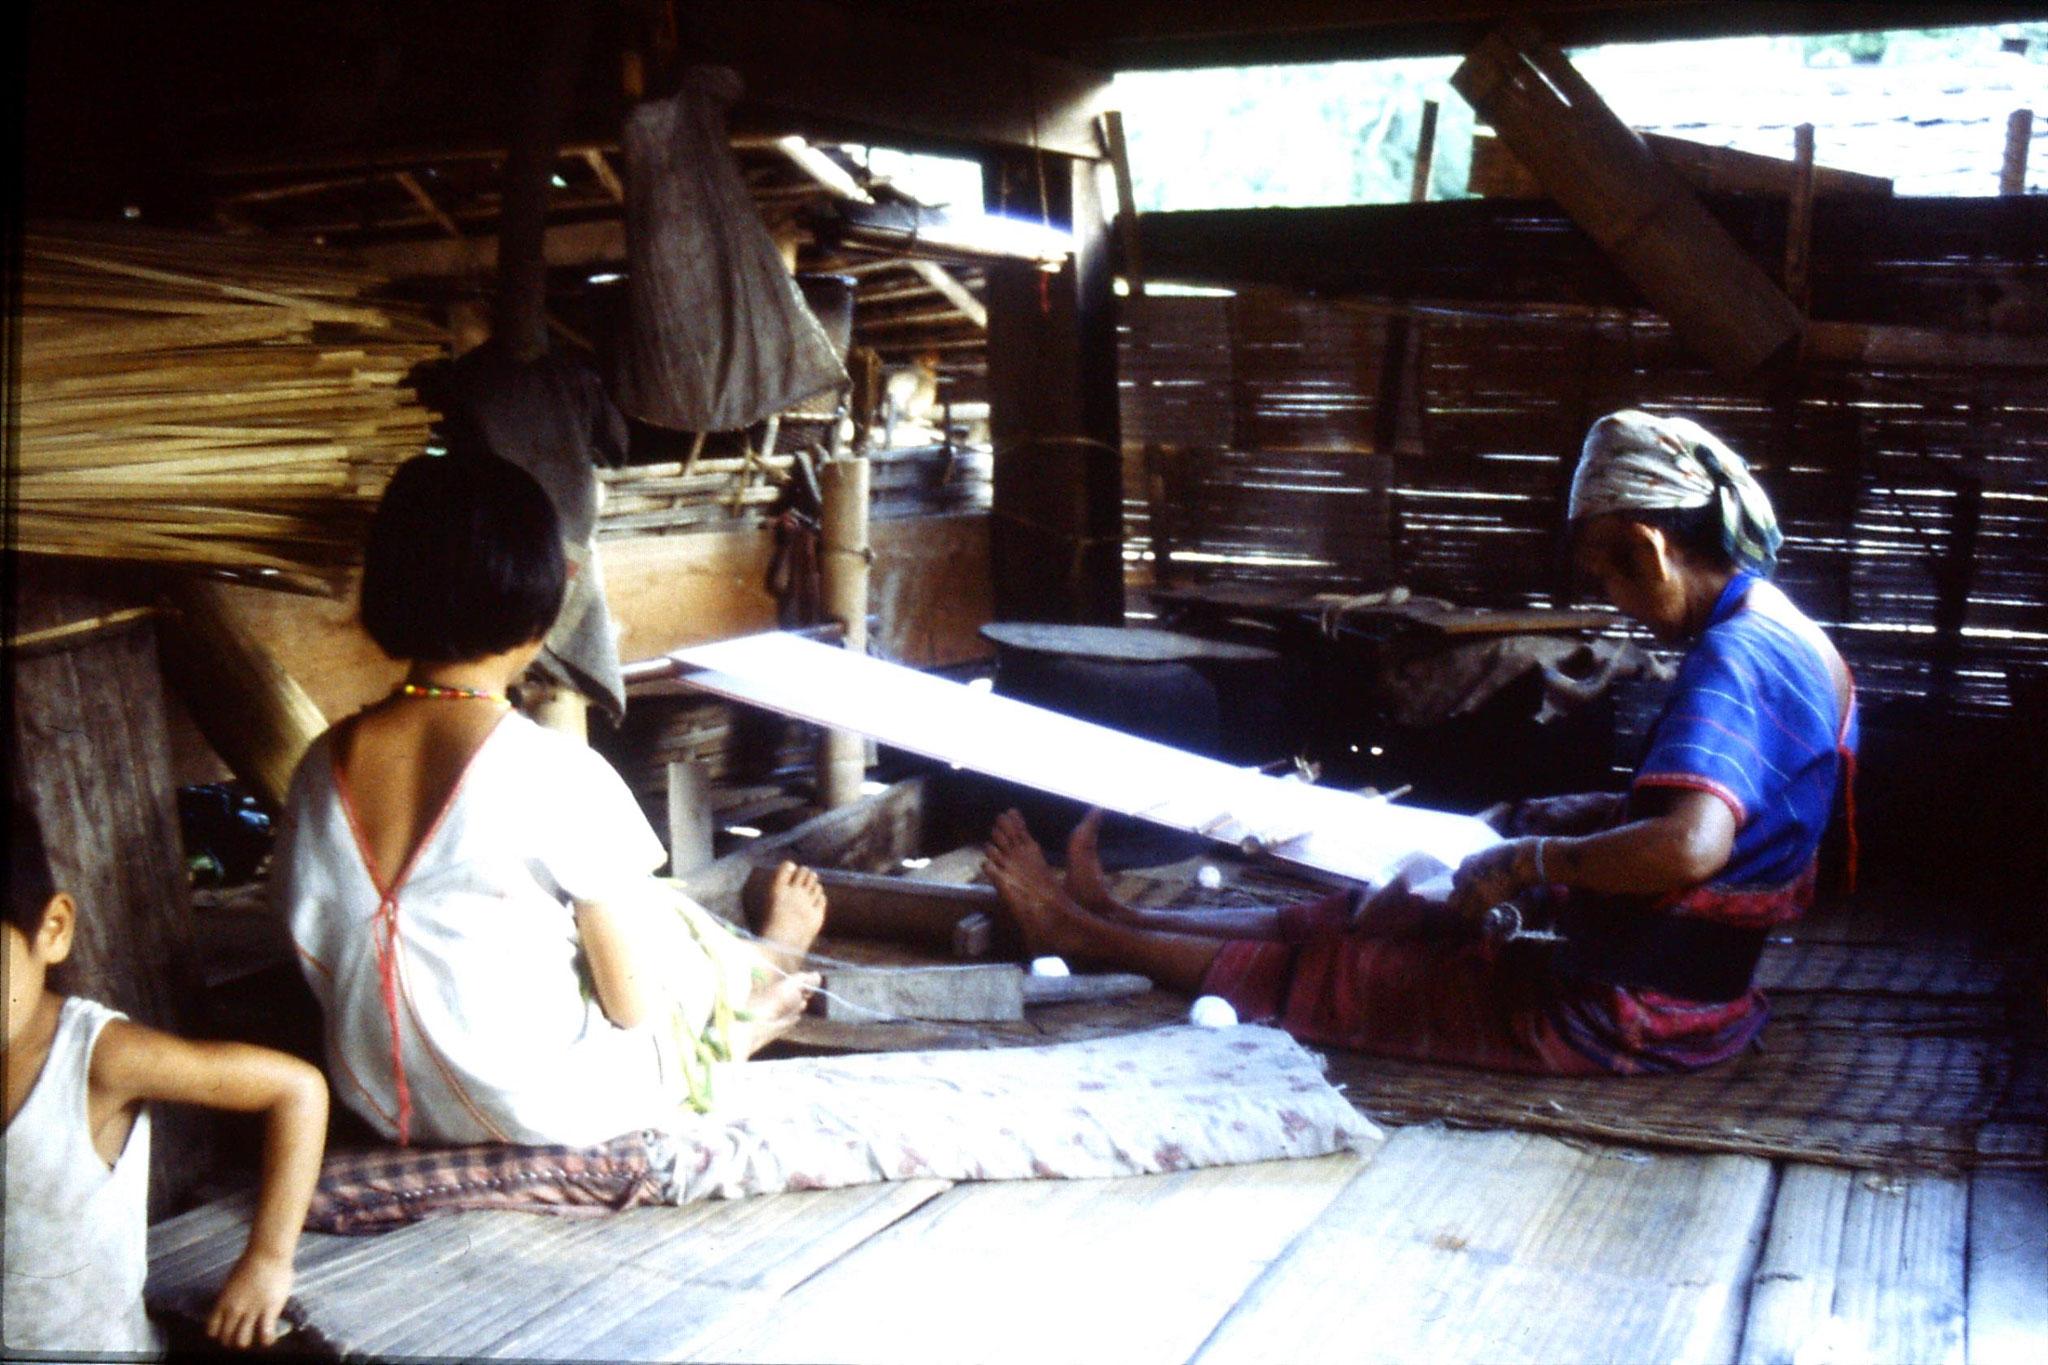 12/6/1990: 33: Trek - Hue Kom Karen village weaving